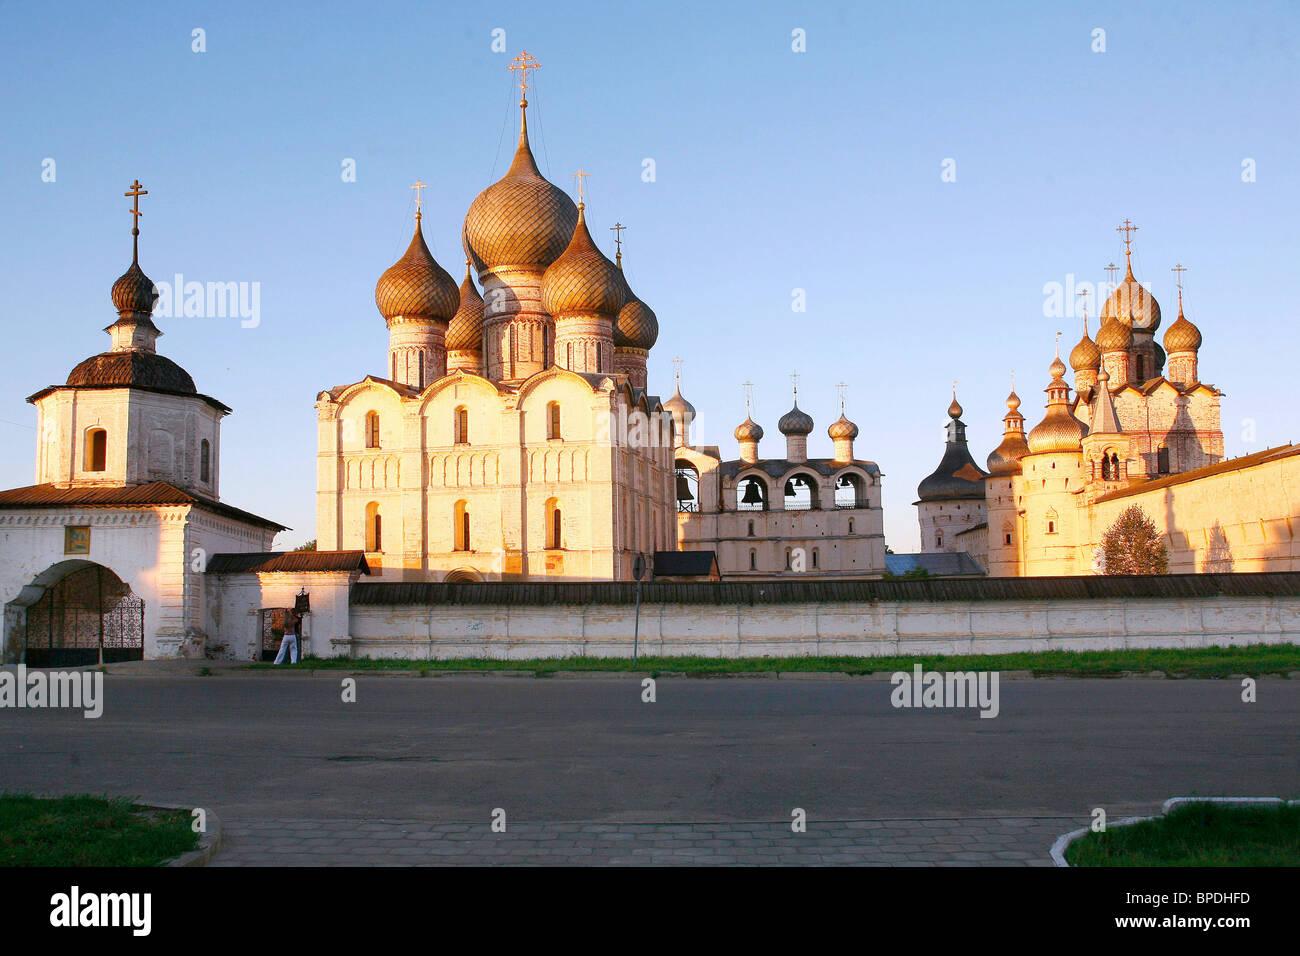 Rostov Kremlin: description, history. State Museum-Reserve Rostov Kremlin 66